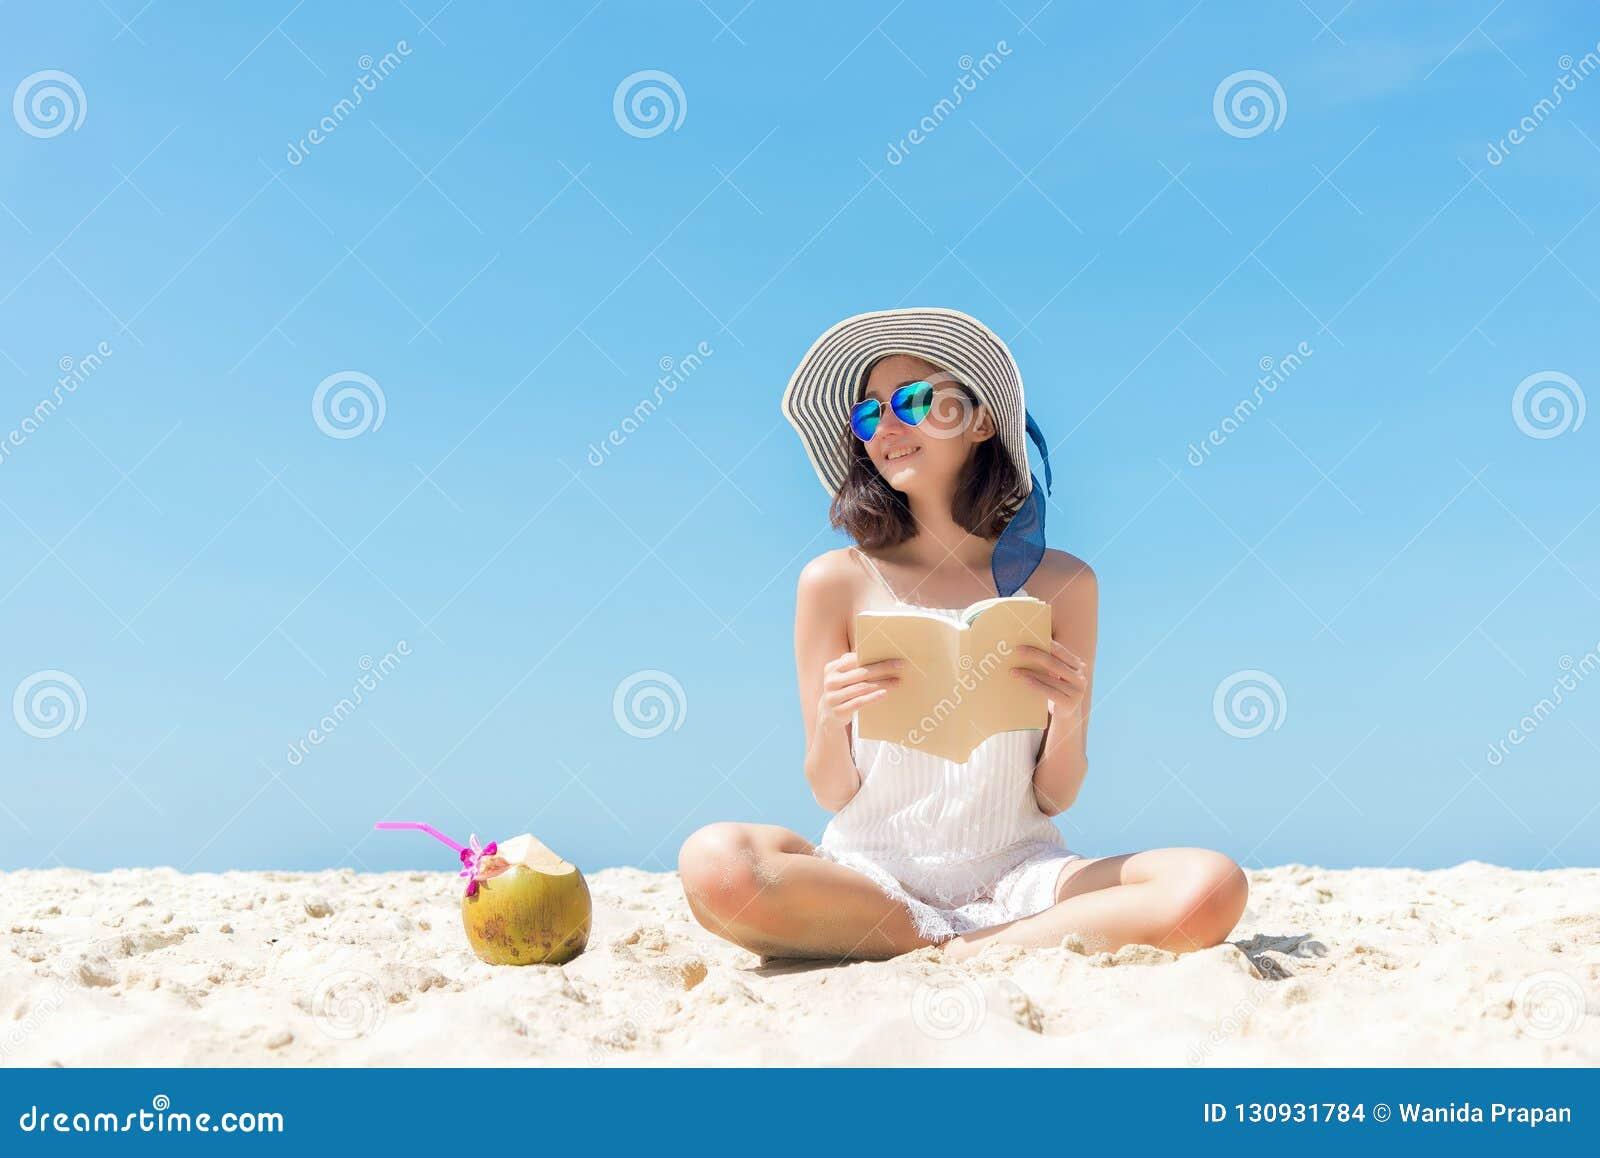 Katya krasnodar夏天领土假期 嗅到的亚洲在海滩的妇女放松和看书,很愉快和豪华在假日夏天,天空蔚蓝后面